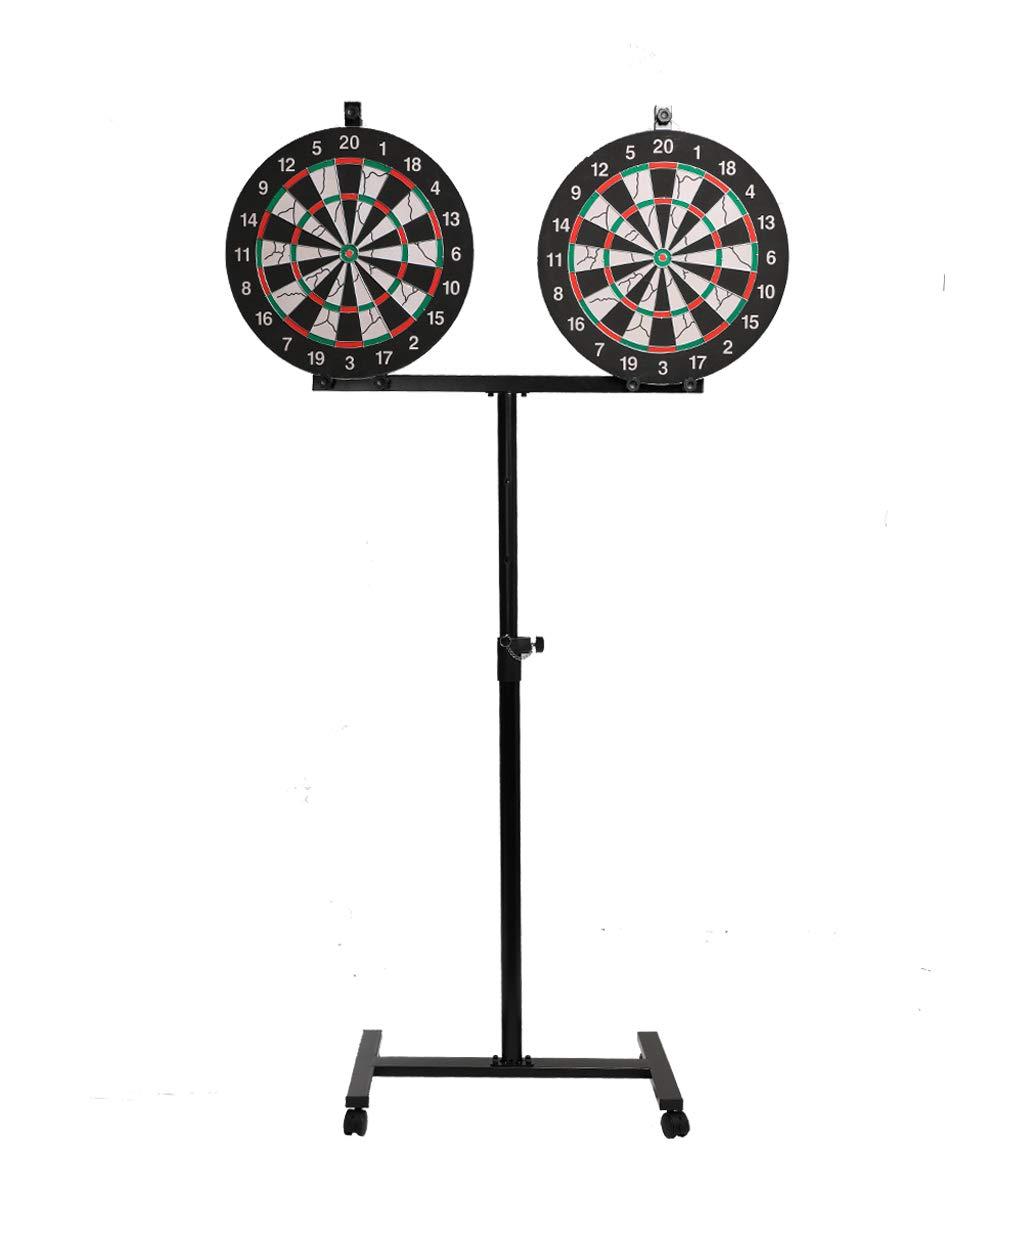 SPRAWL Freestanding Dartboard Set